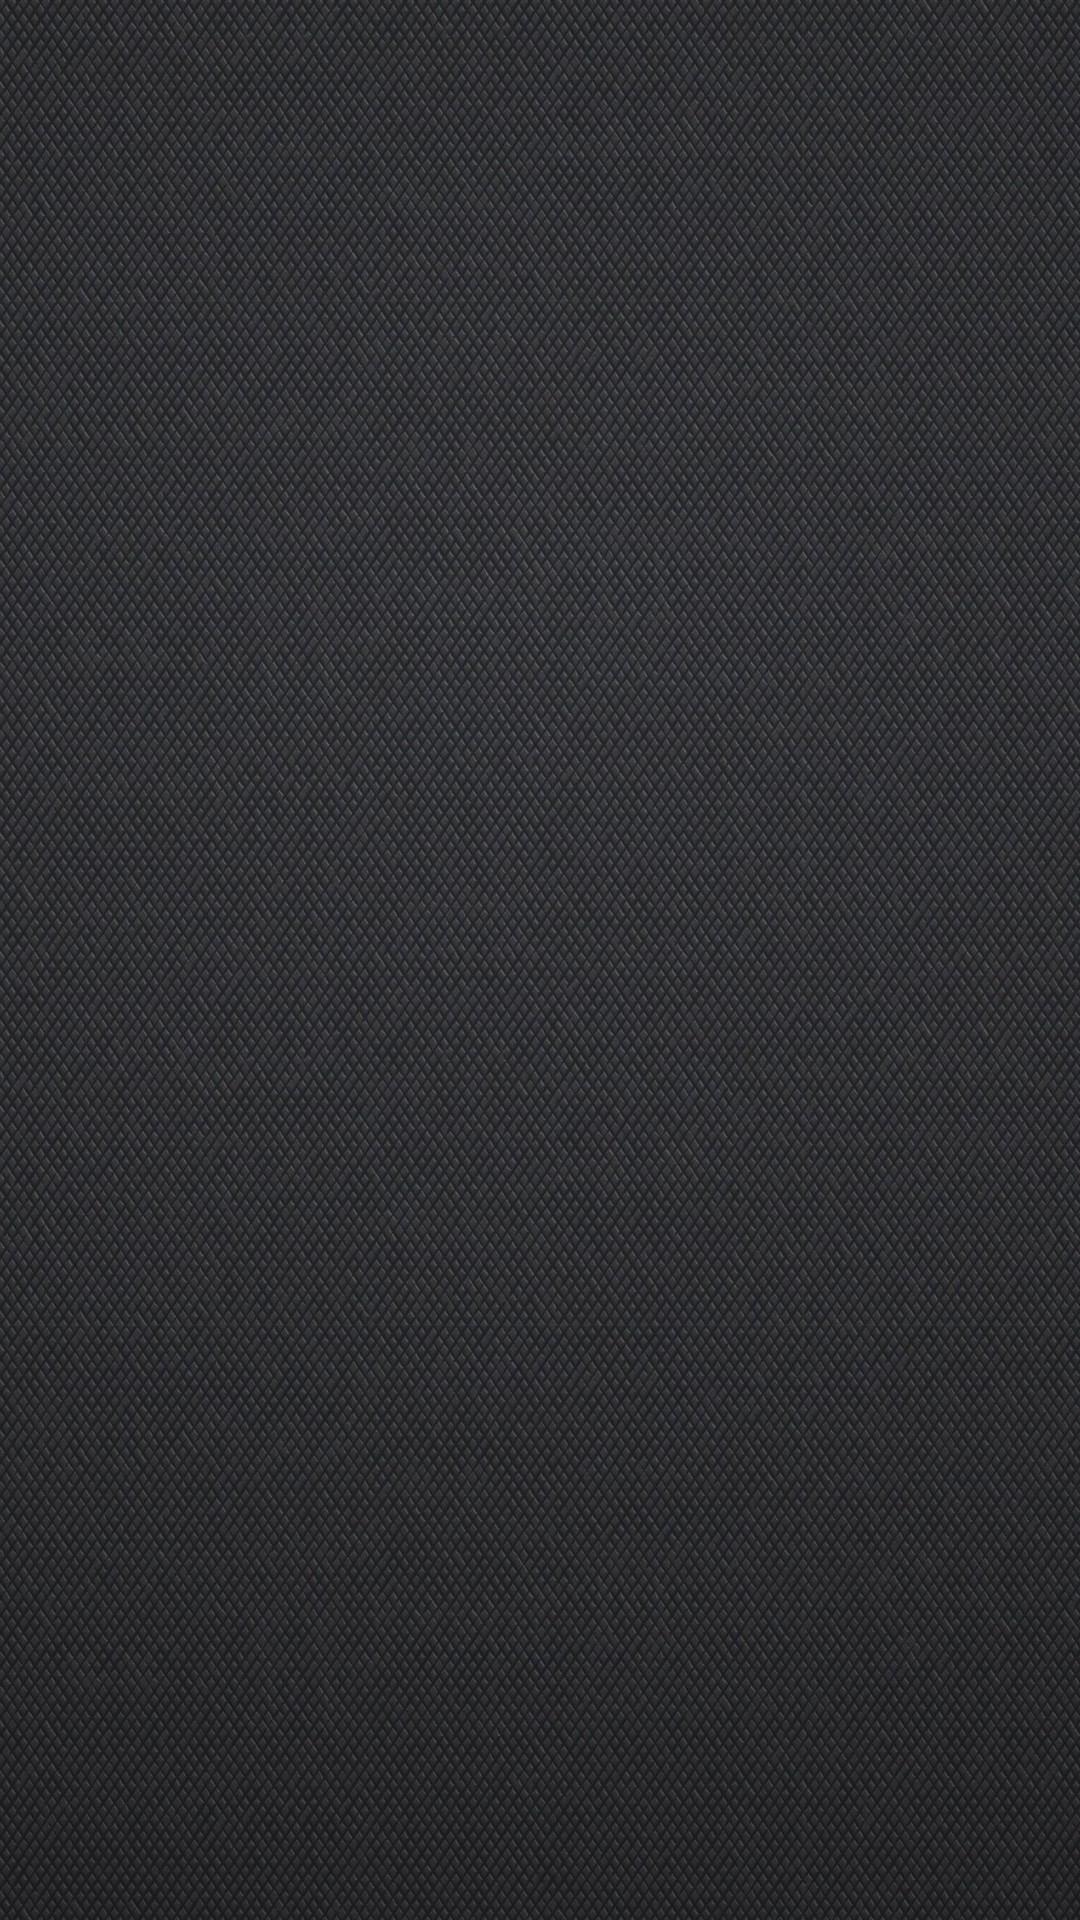 Dark Grey Wallpaper Iphone